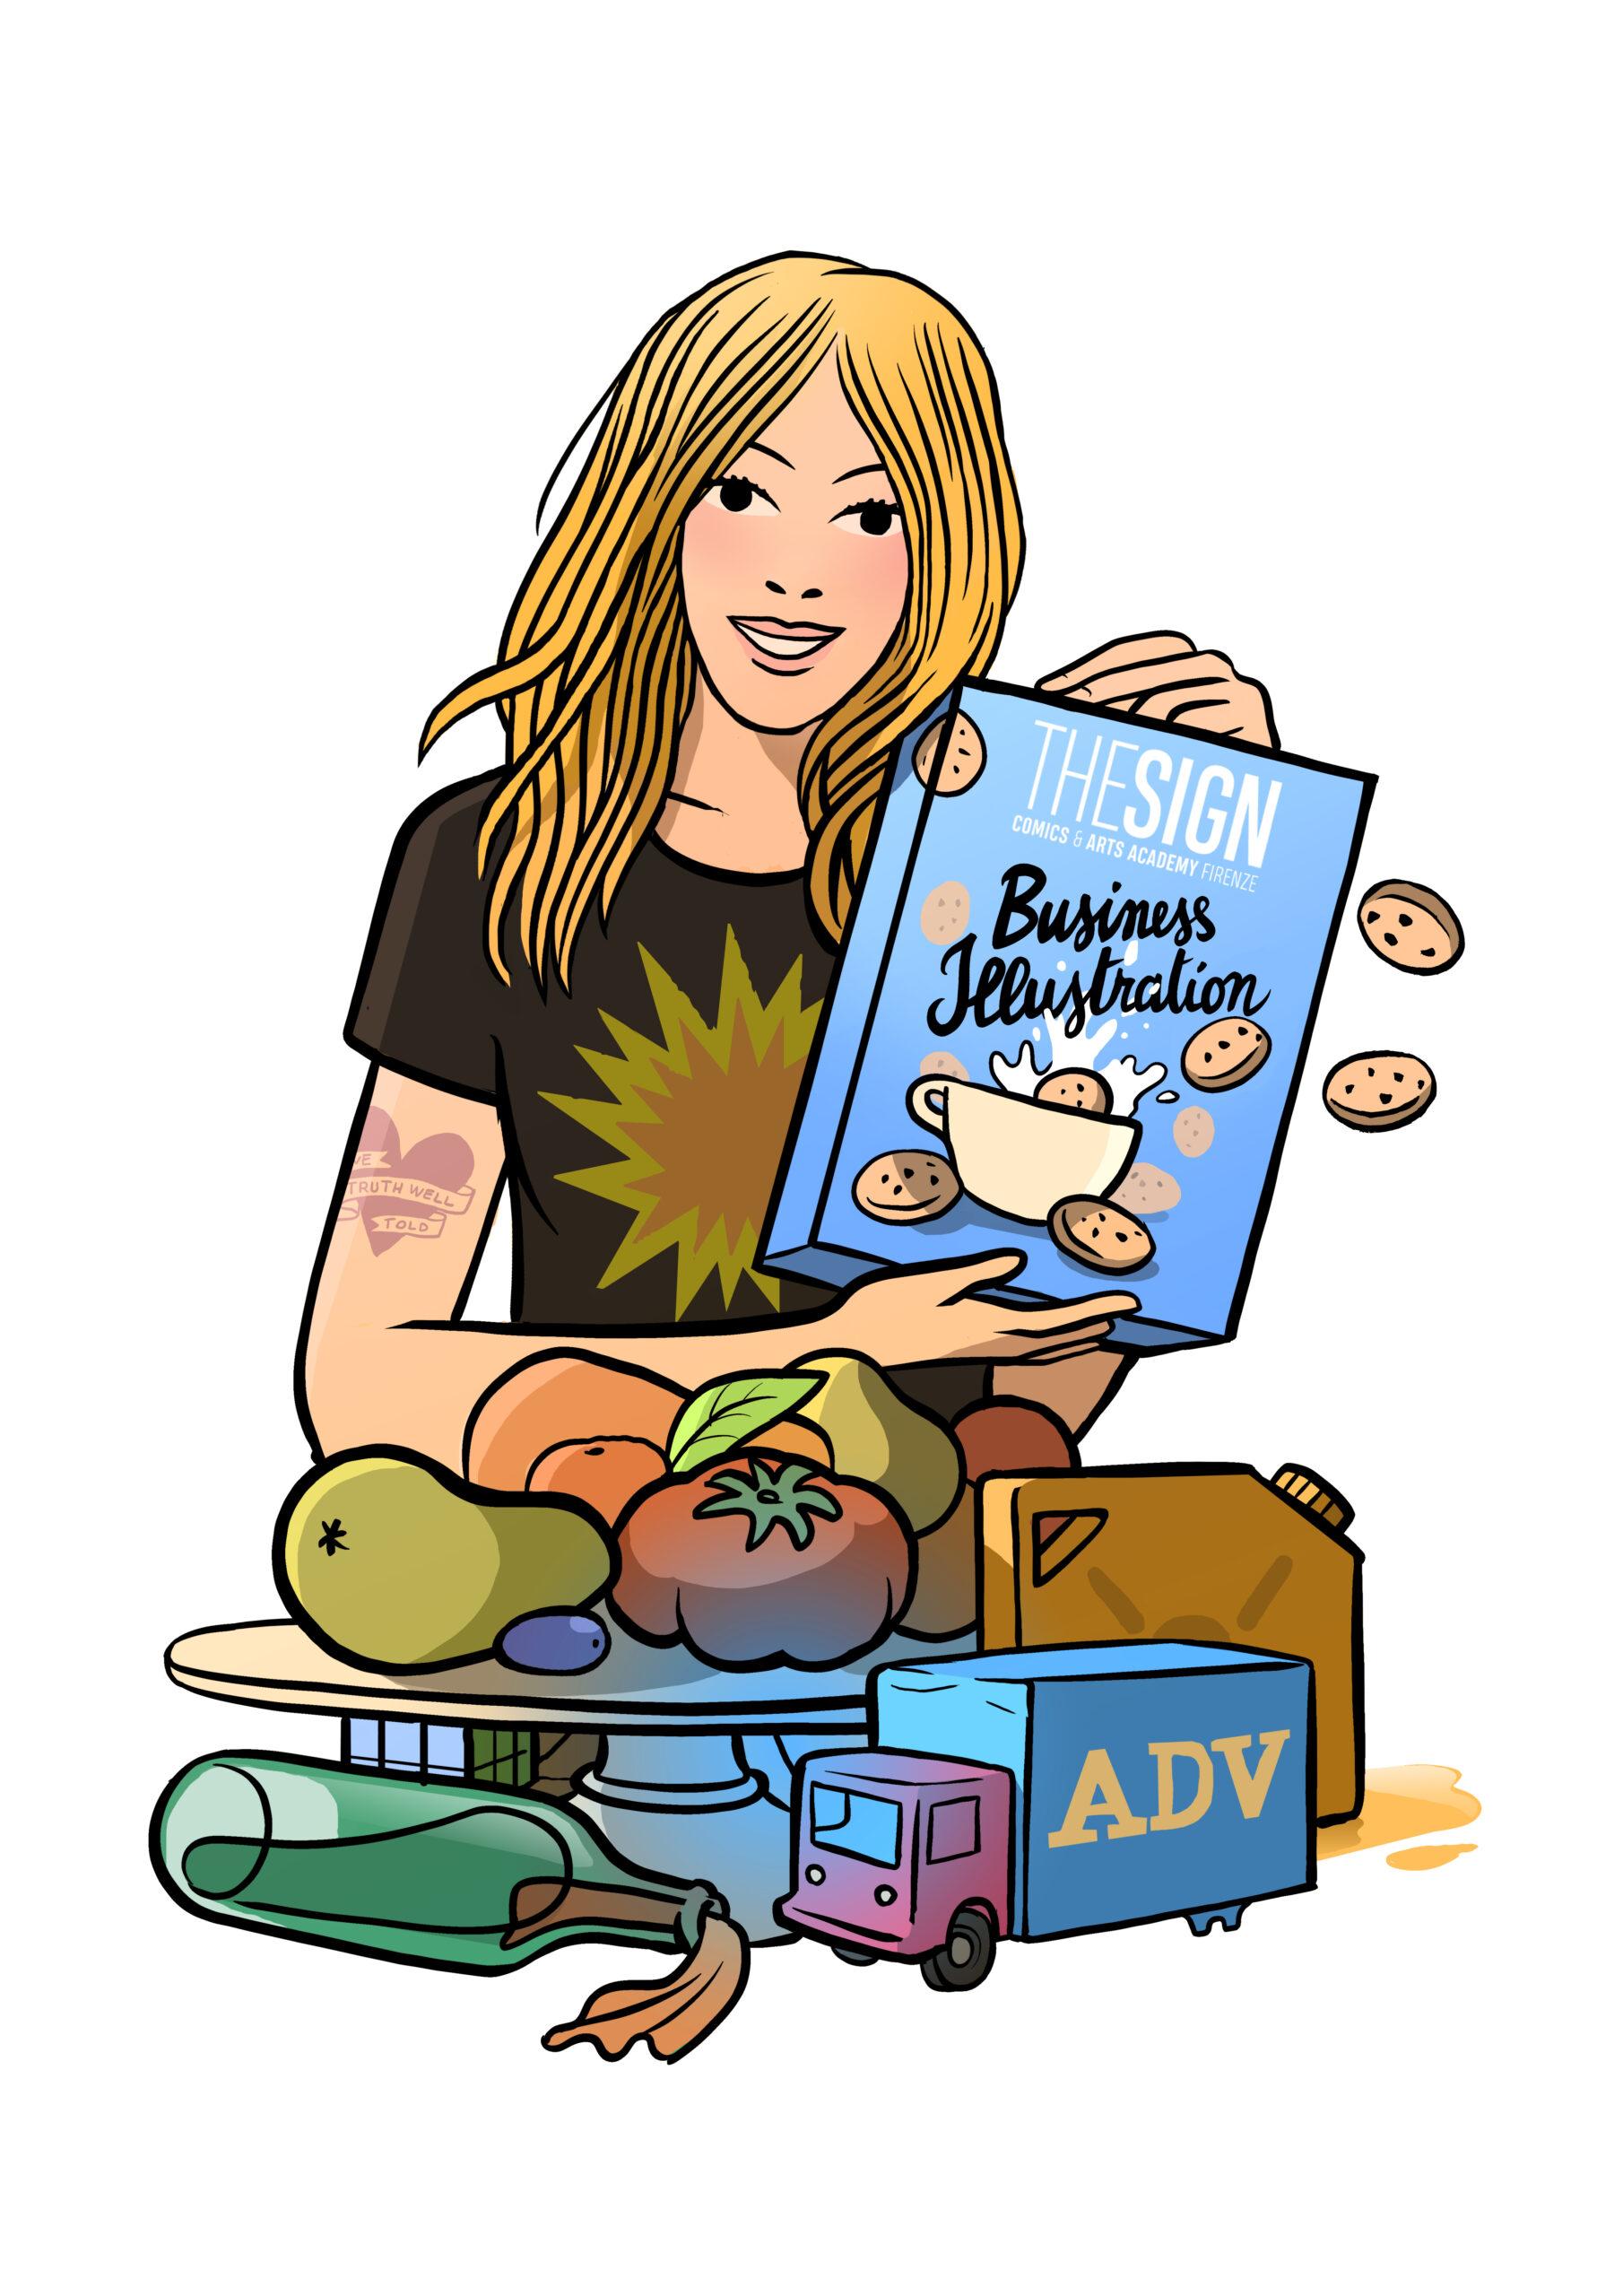 Business Illustration: nuovo corso online!